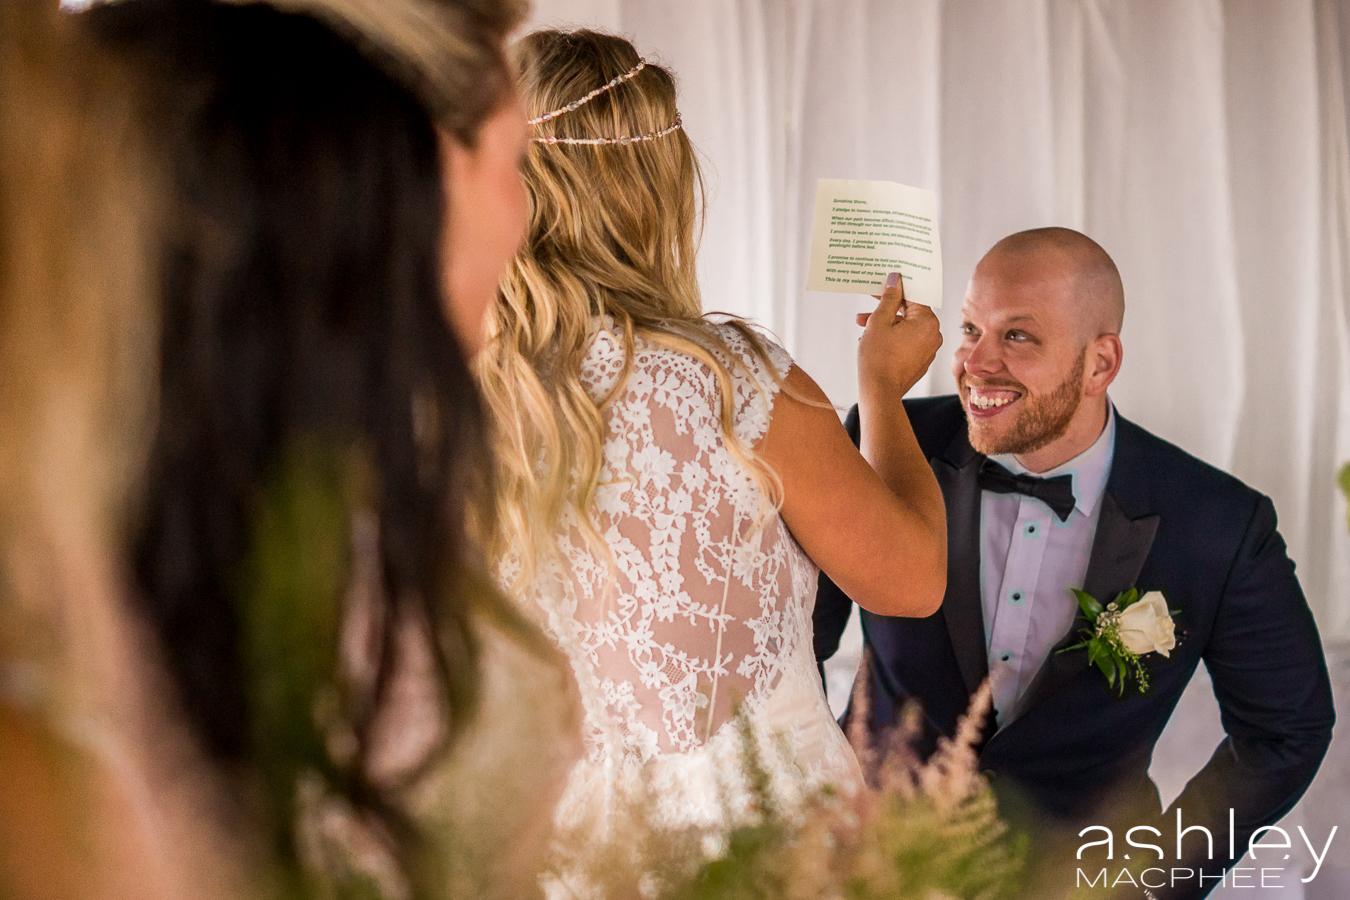 Ashley MacPhee Photography Hudson Yacht Club wedding photographer (54 of 112).jpg